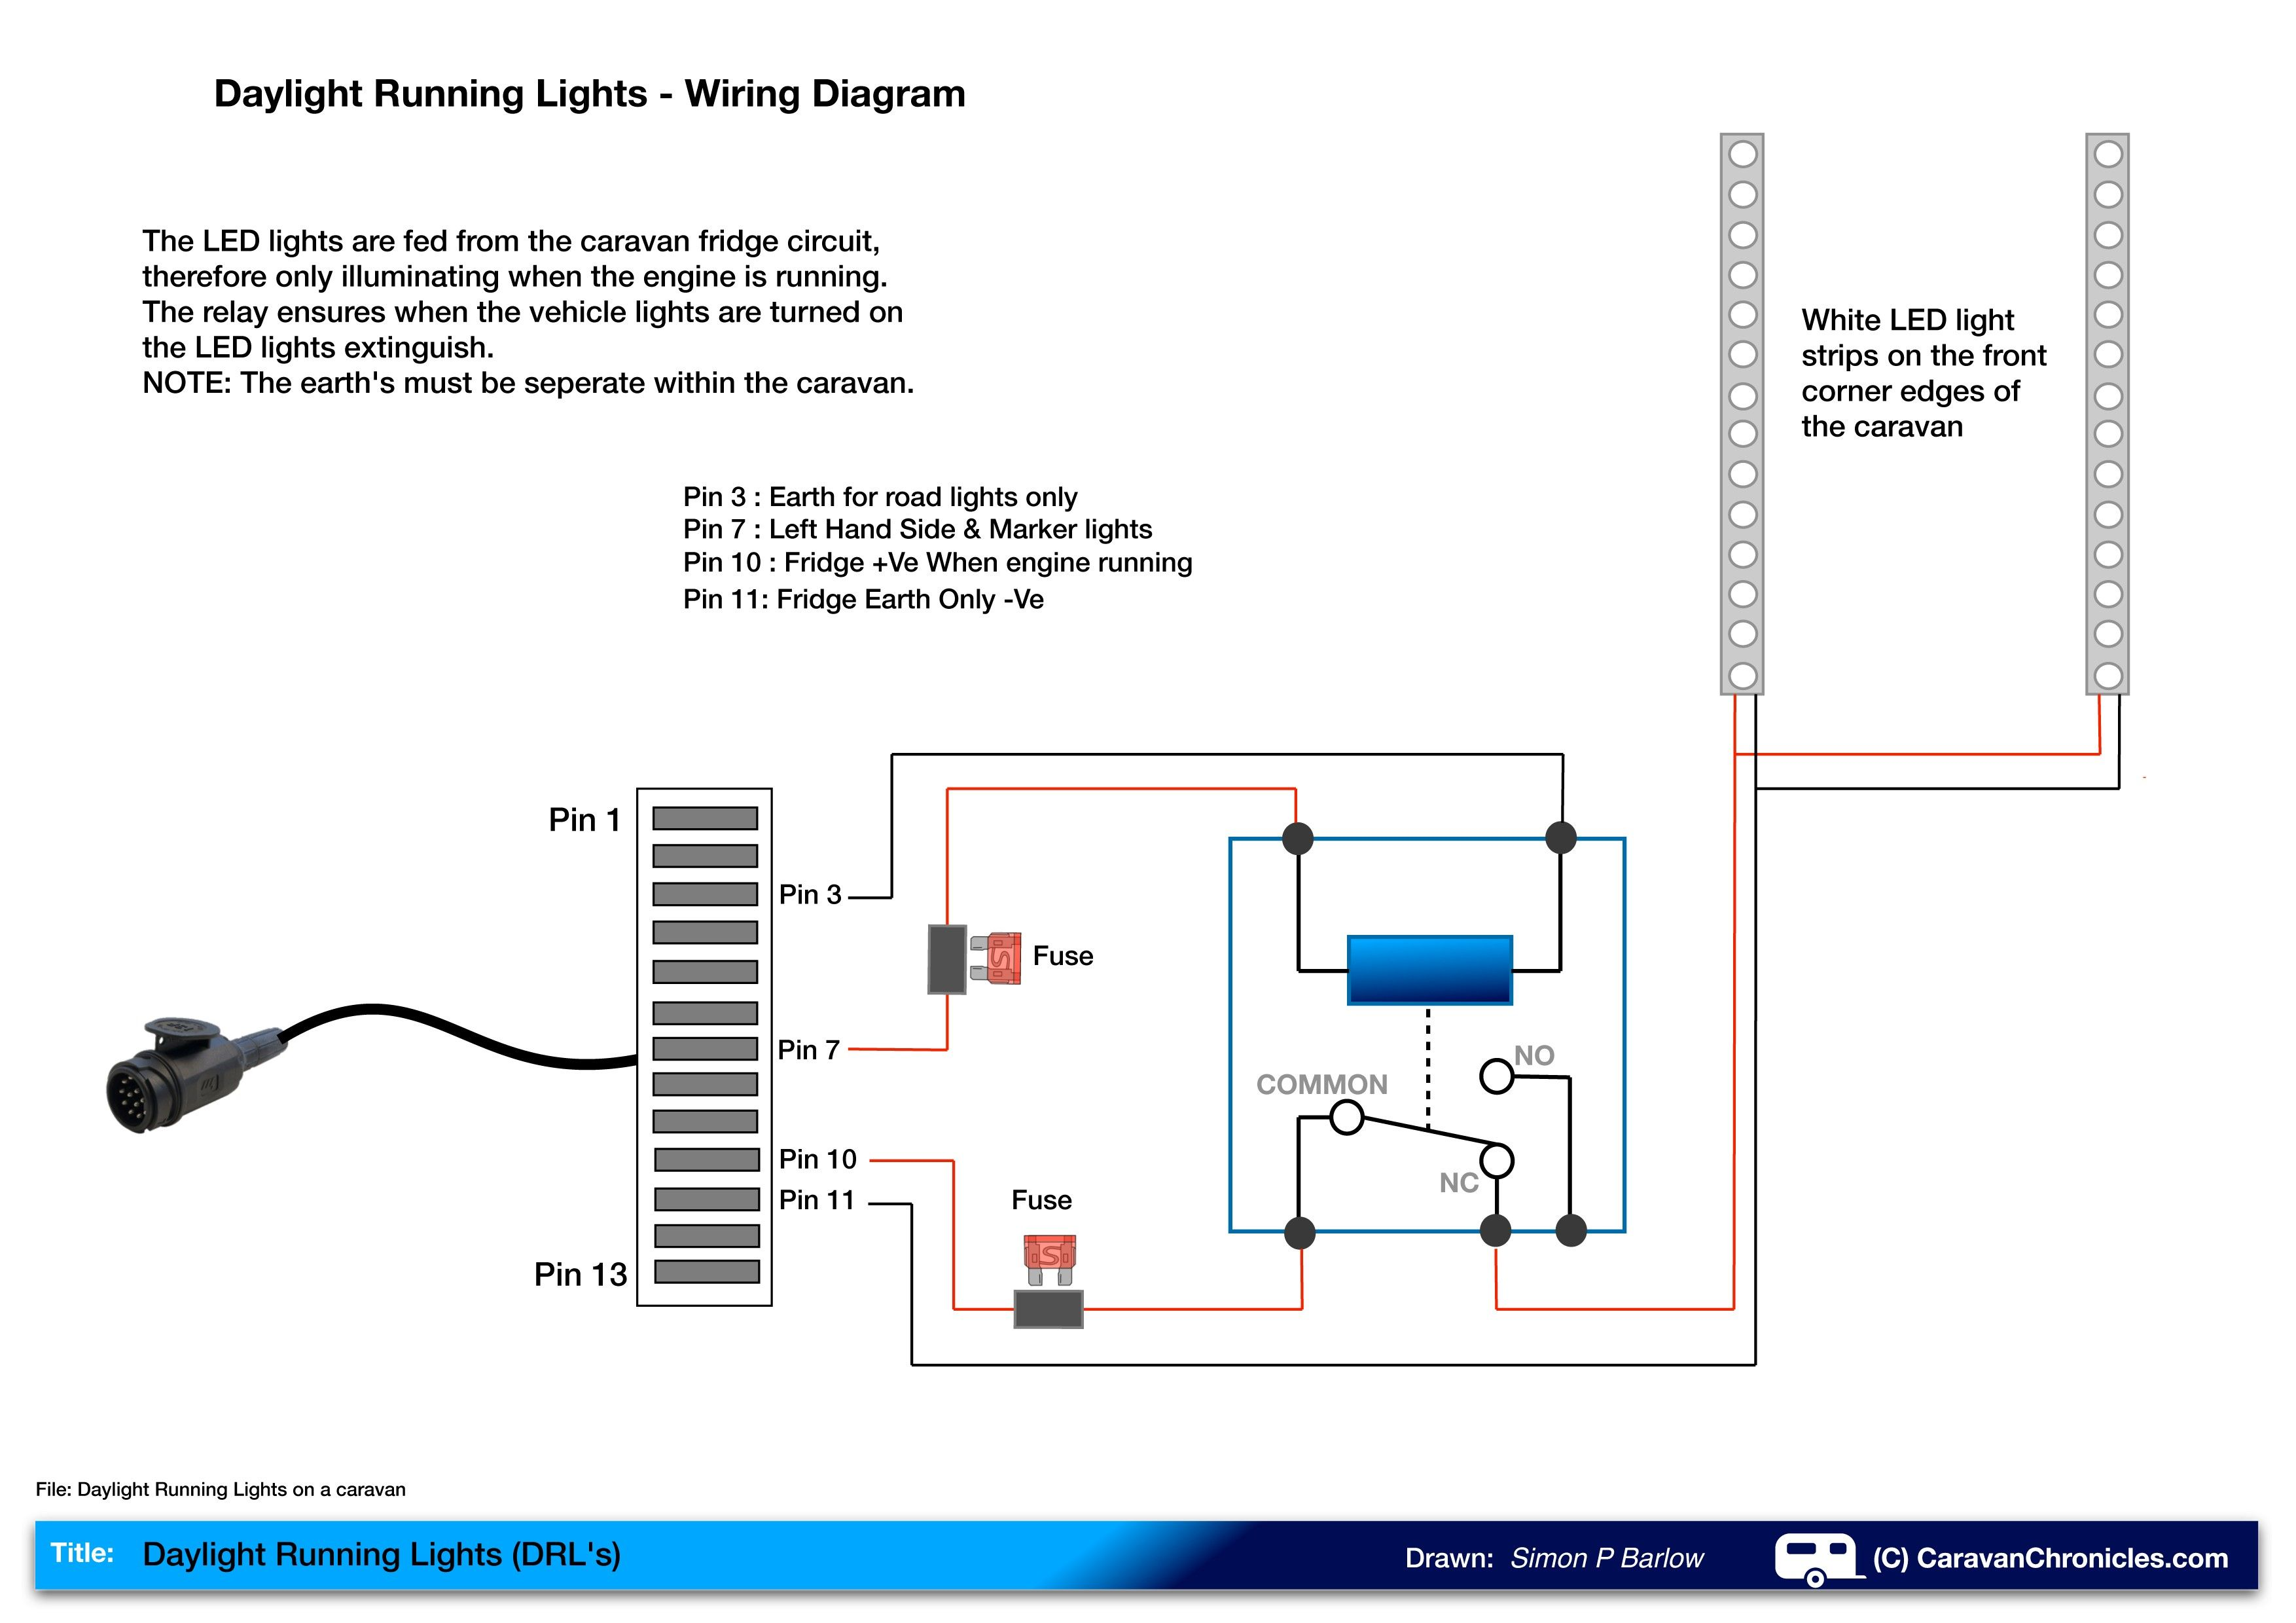 Best Of Wiring Diagram For Daytime Running Lights Diagrams Digramssample Diagramimages Wiringdiagramsample Wiringdi Caravan Diagram Trailer Wiring Diagram